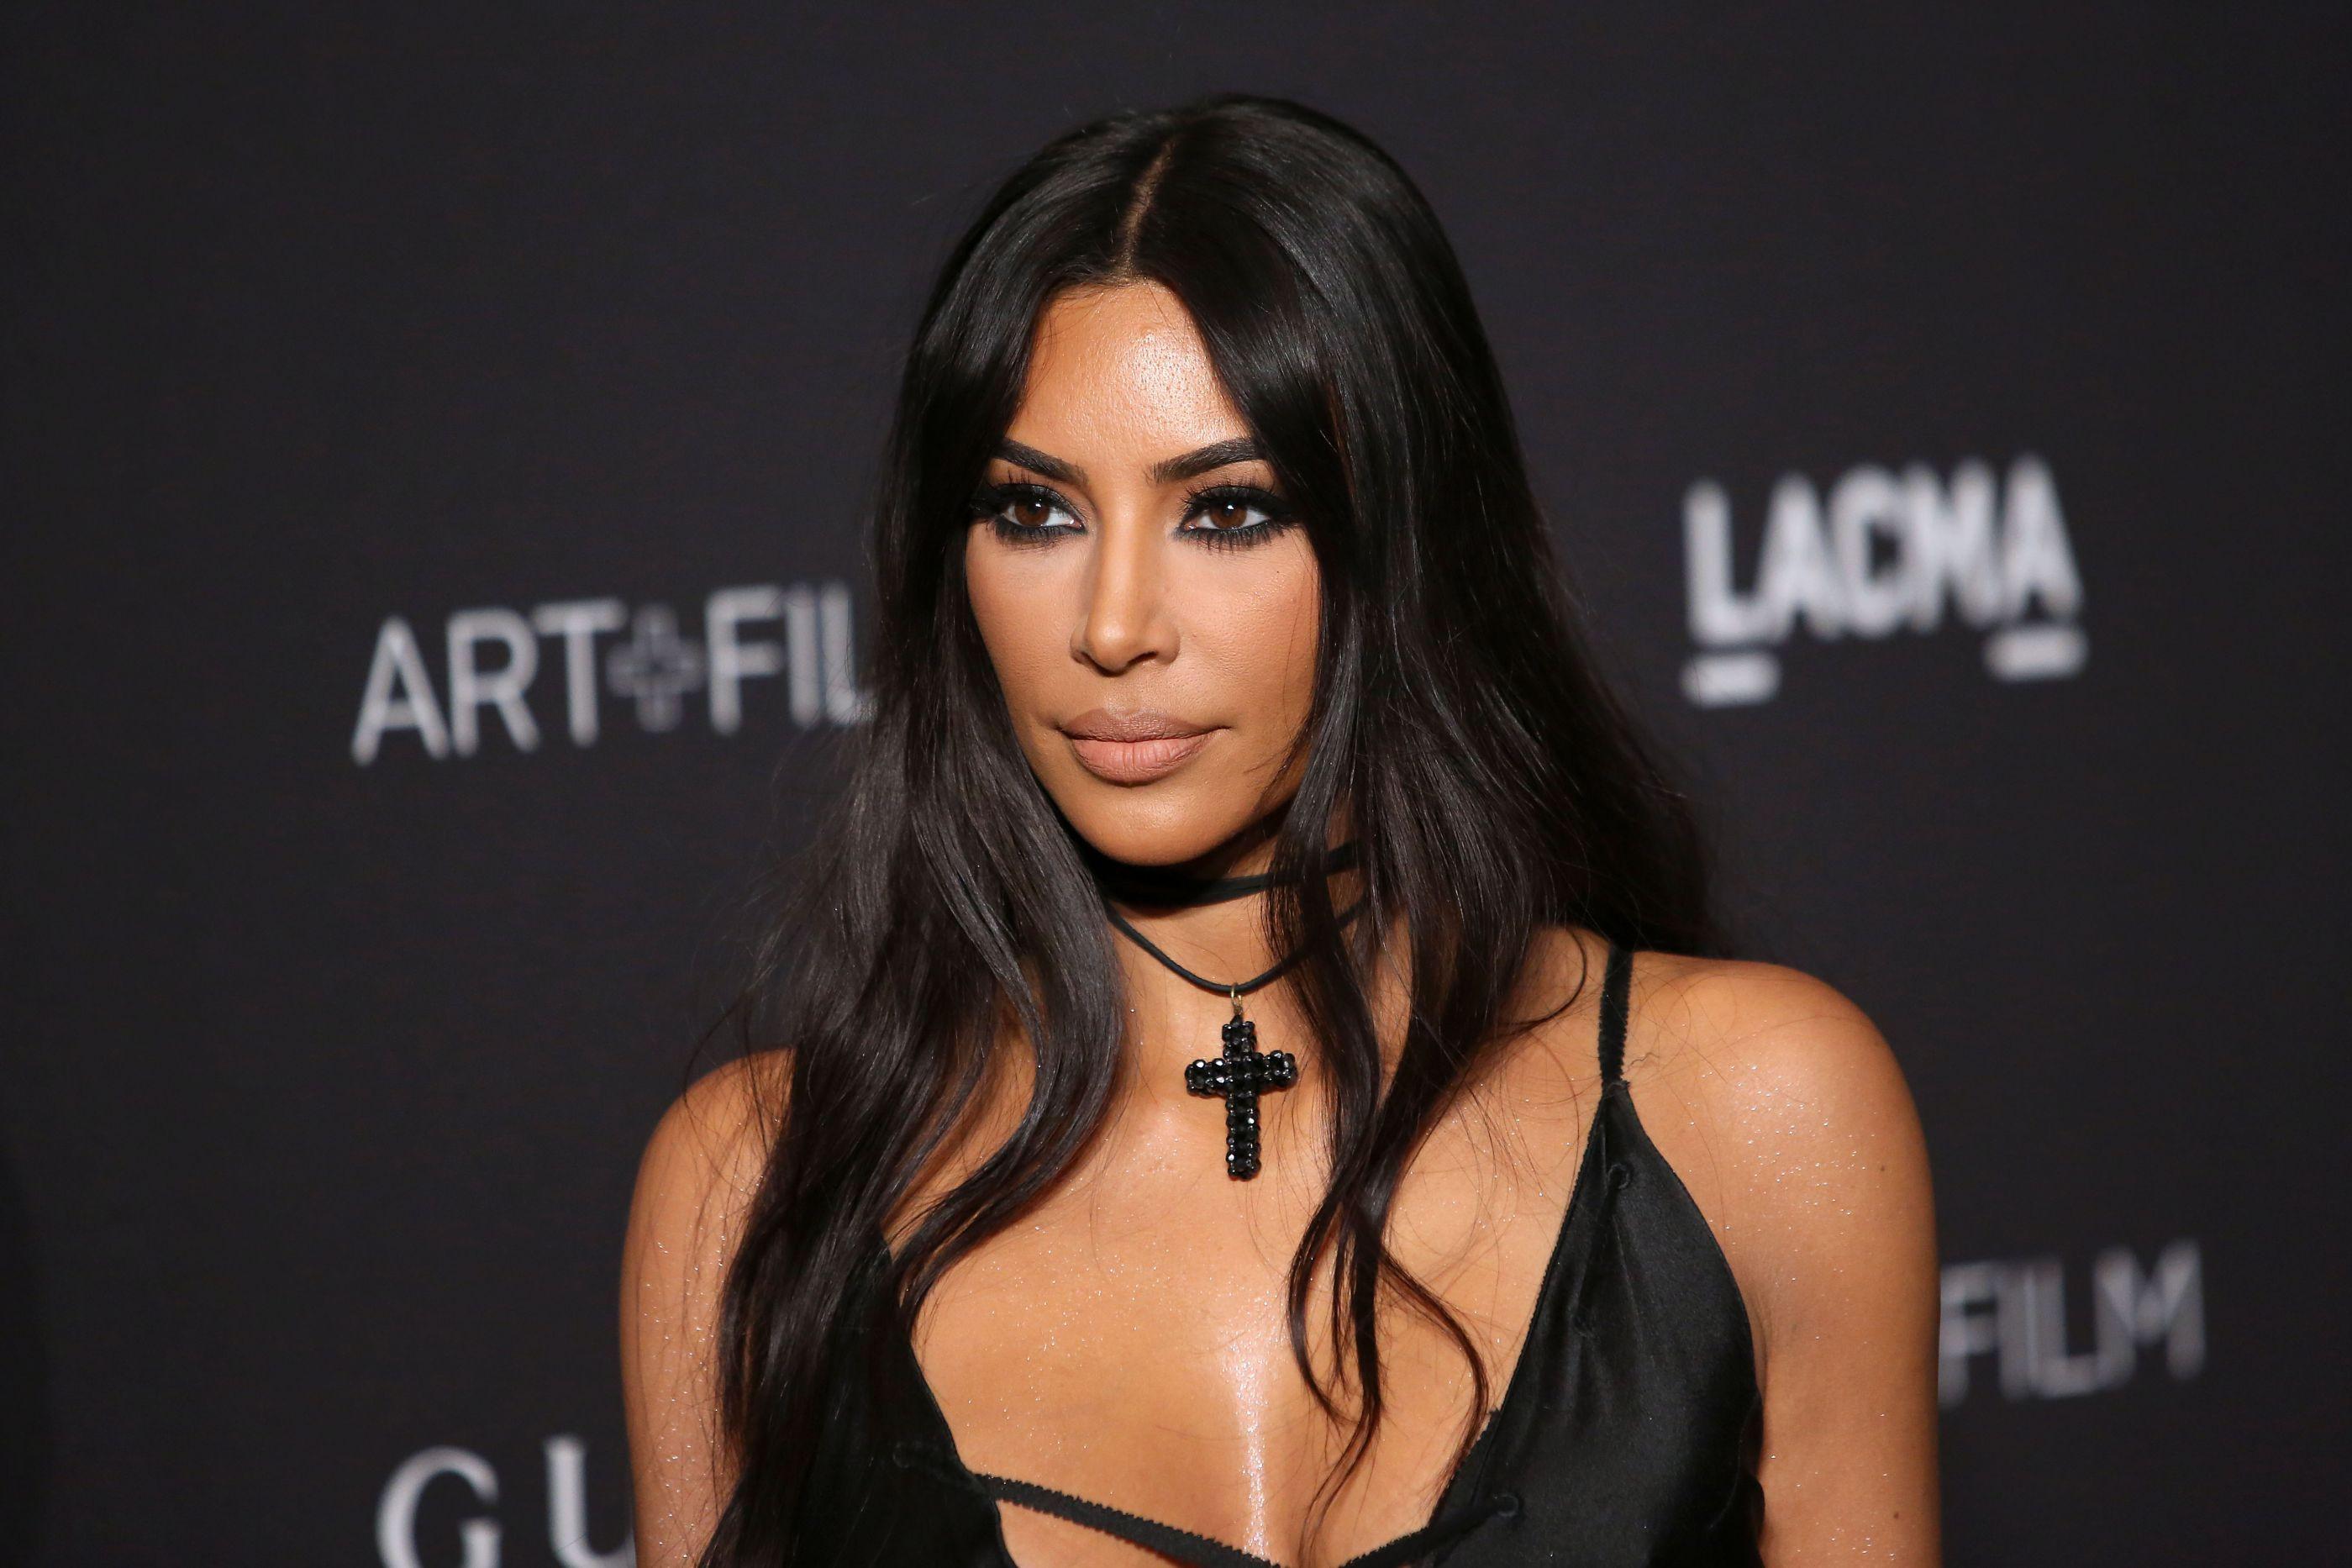 Kim Kardashian supera irmãs e surpreende fãs